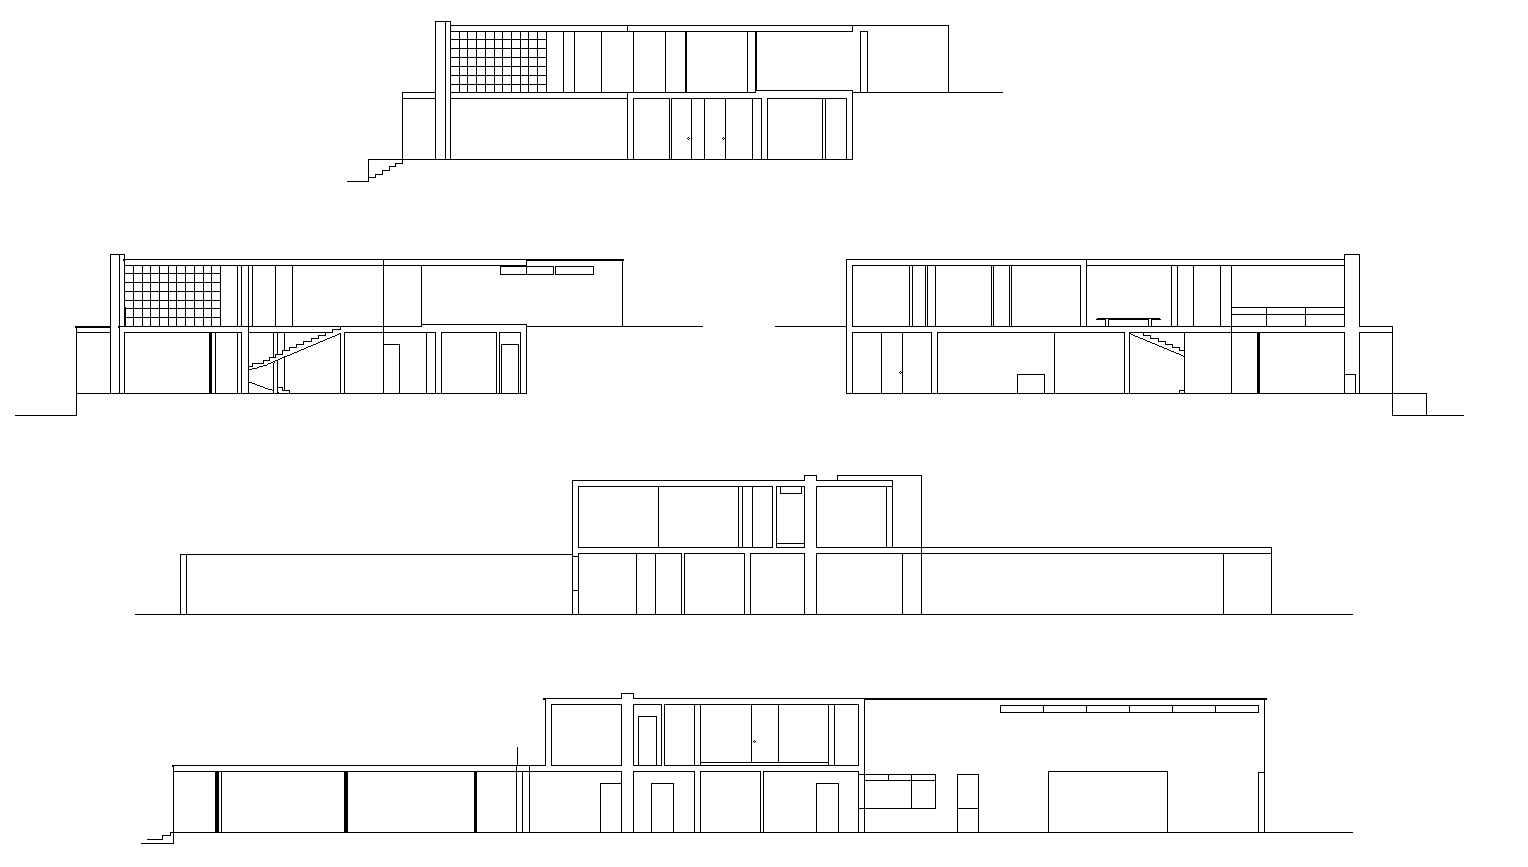 Ludwig Mies Van Der Rohe Farnsworth House Free Cad Blocks  # Muebles Mies Van Der Rohe Autocad